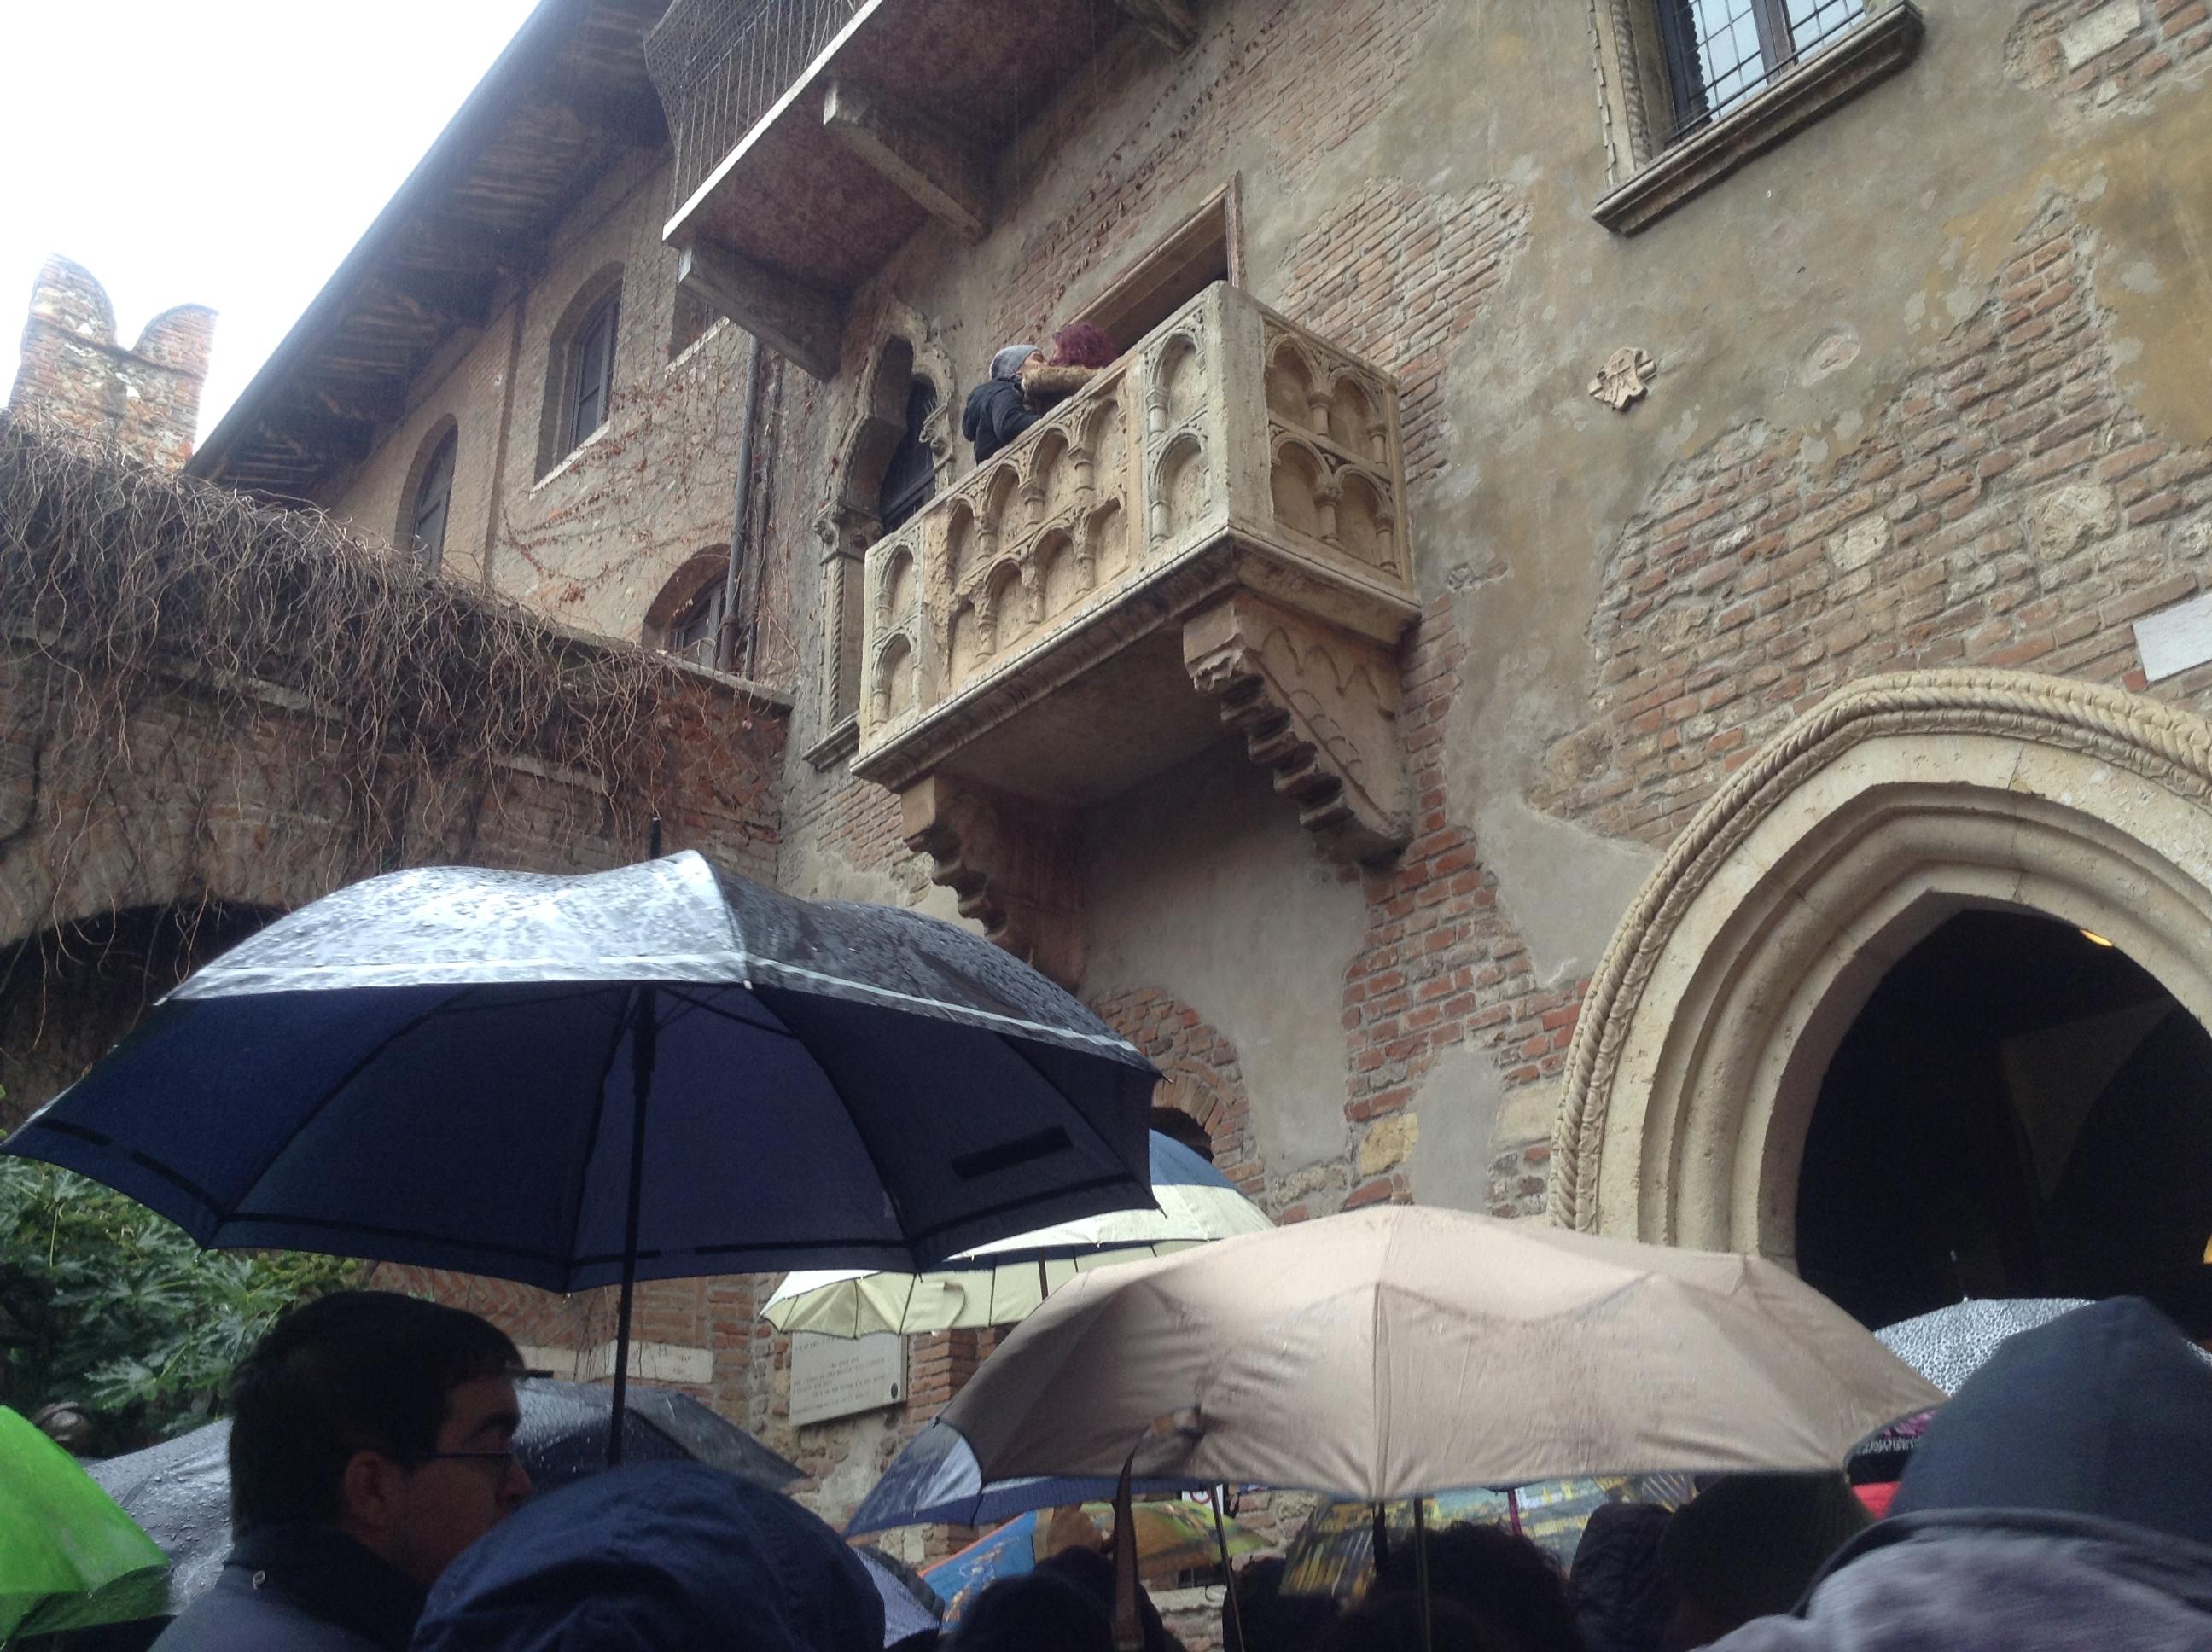 Casa di Giulietta, MilanKaRaja.com